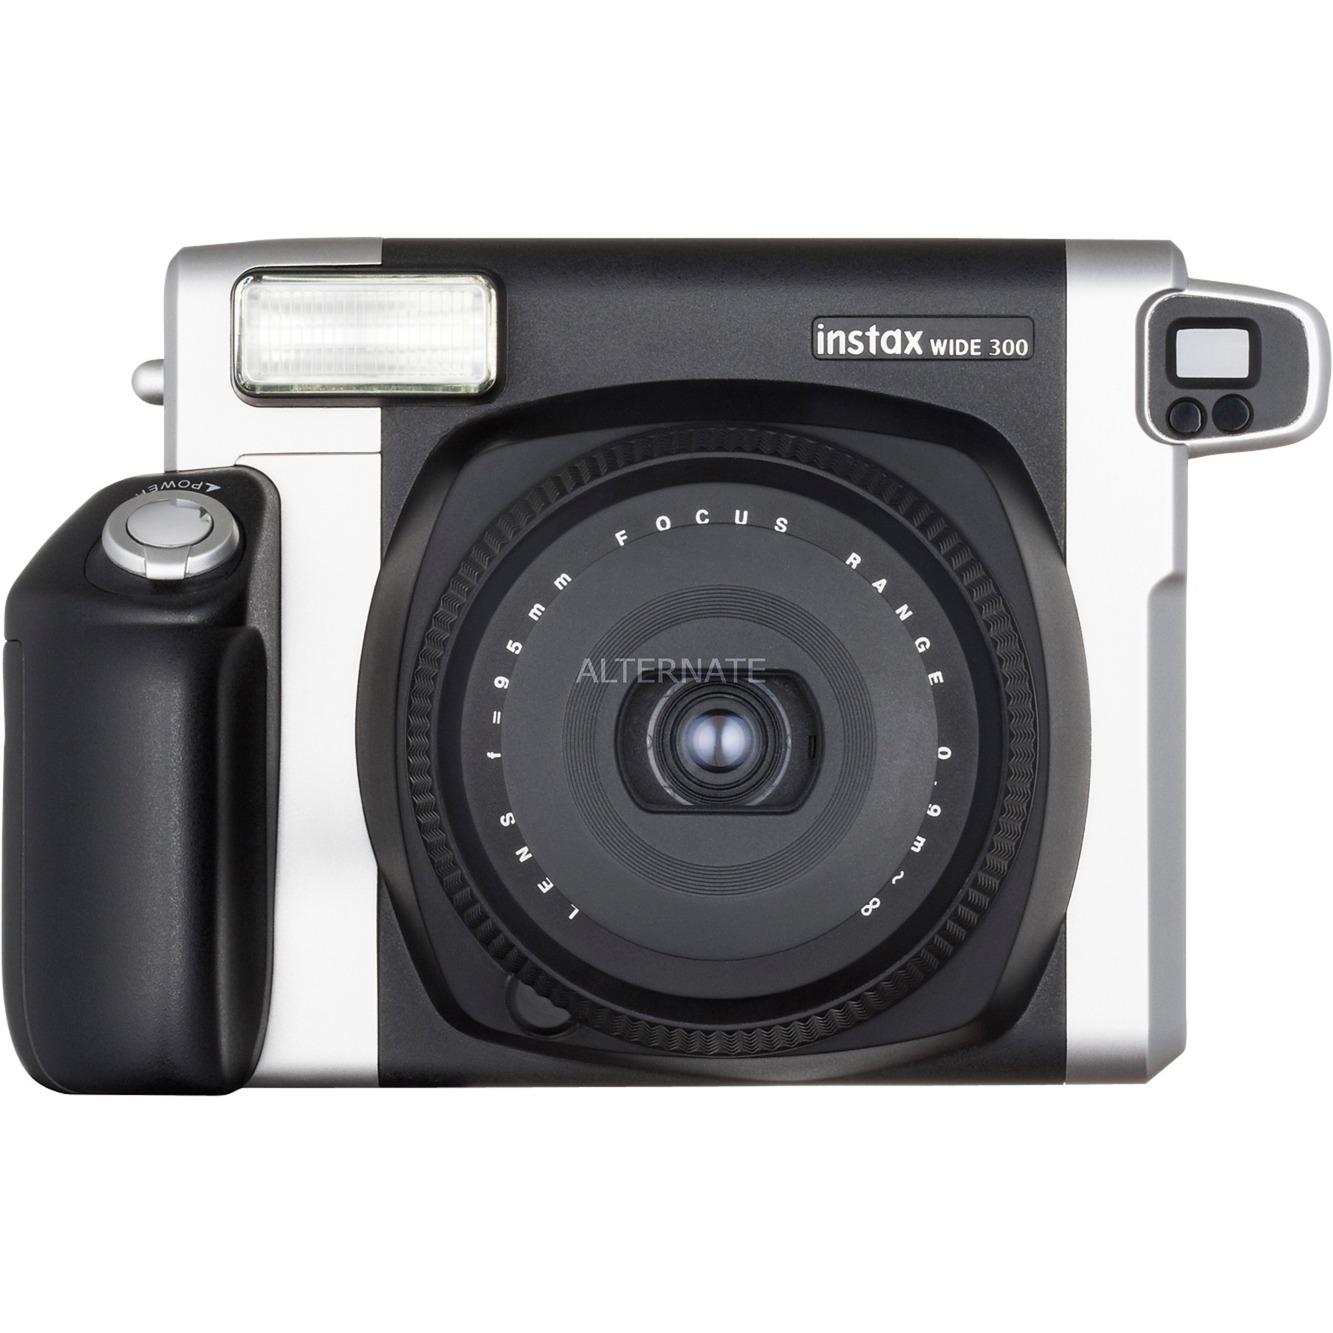 Instax Wide 300 62 x 99mm Negro, Plata cámara instantánea impresión